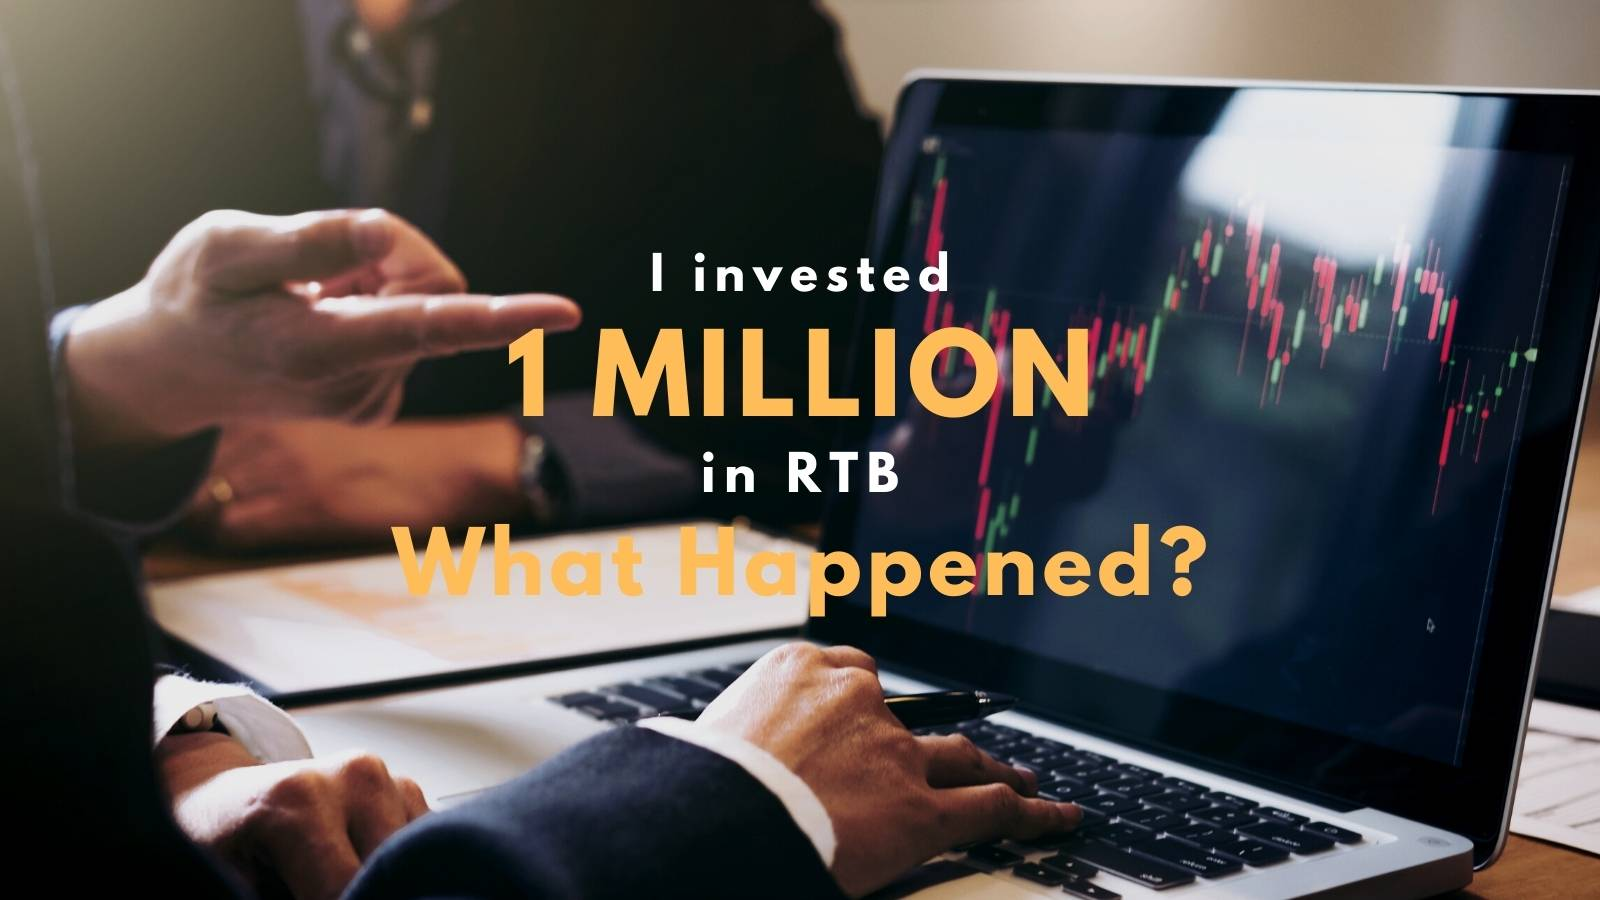 million investment rtb philippines